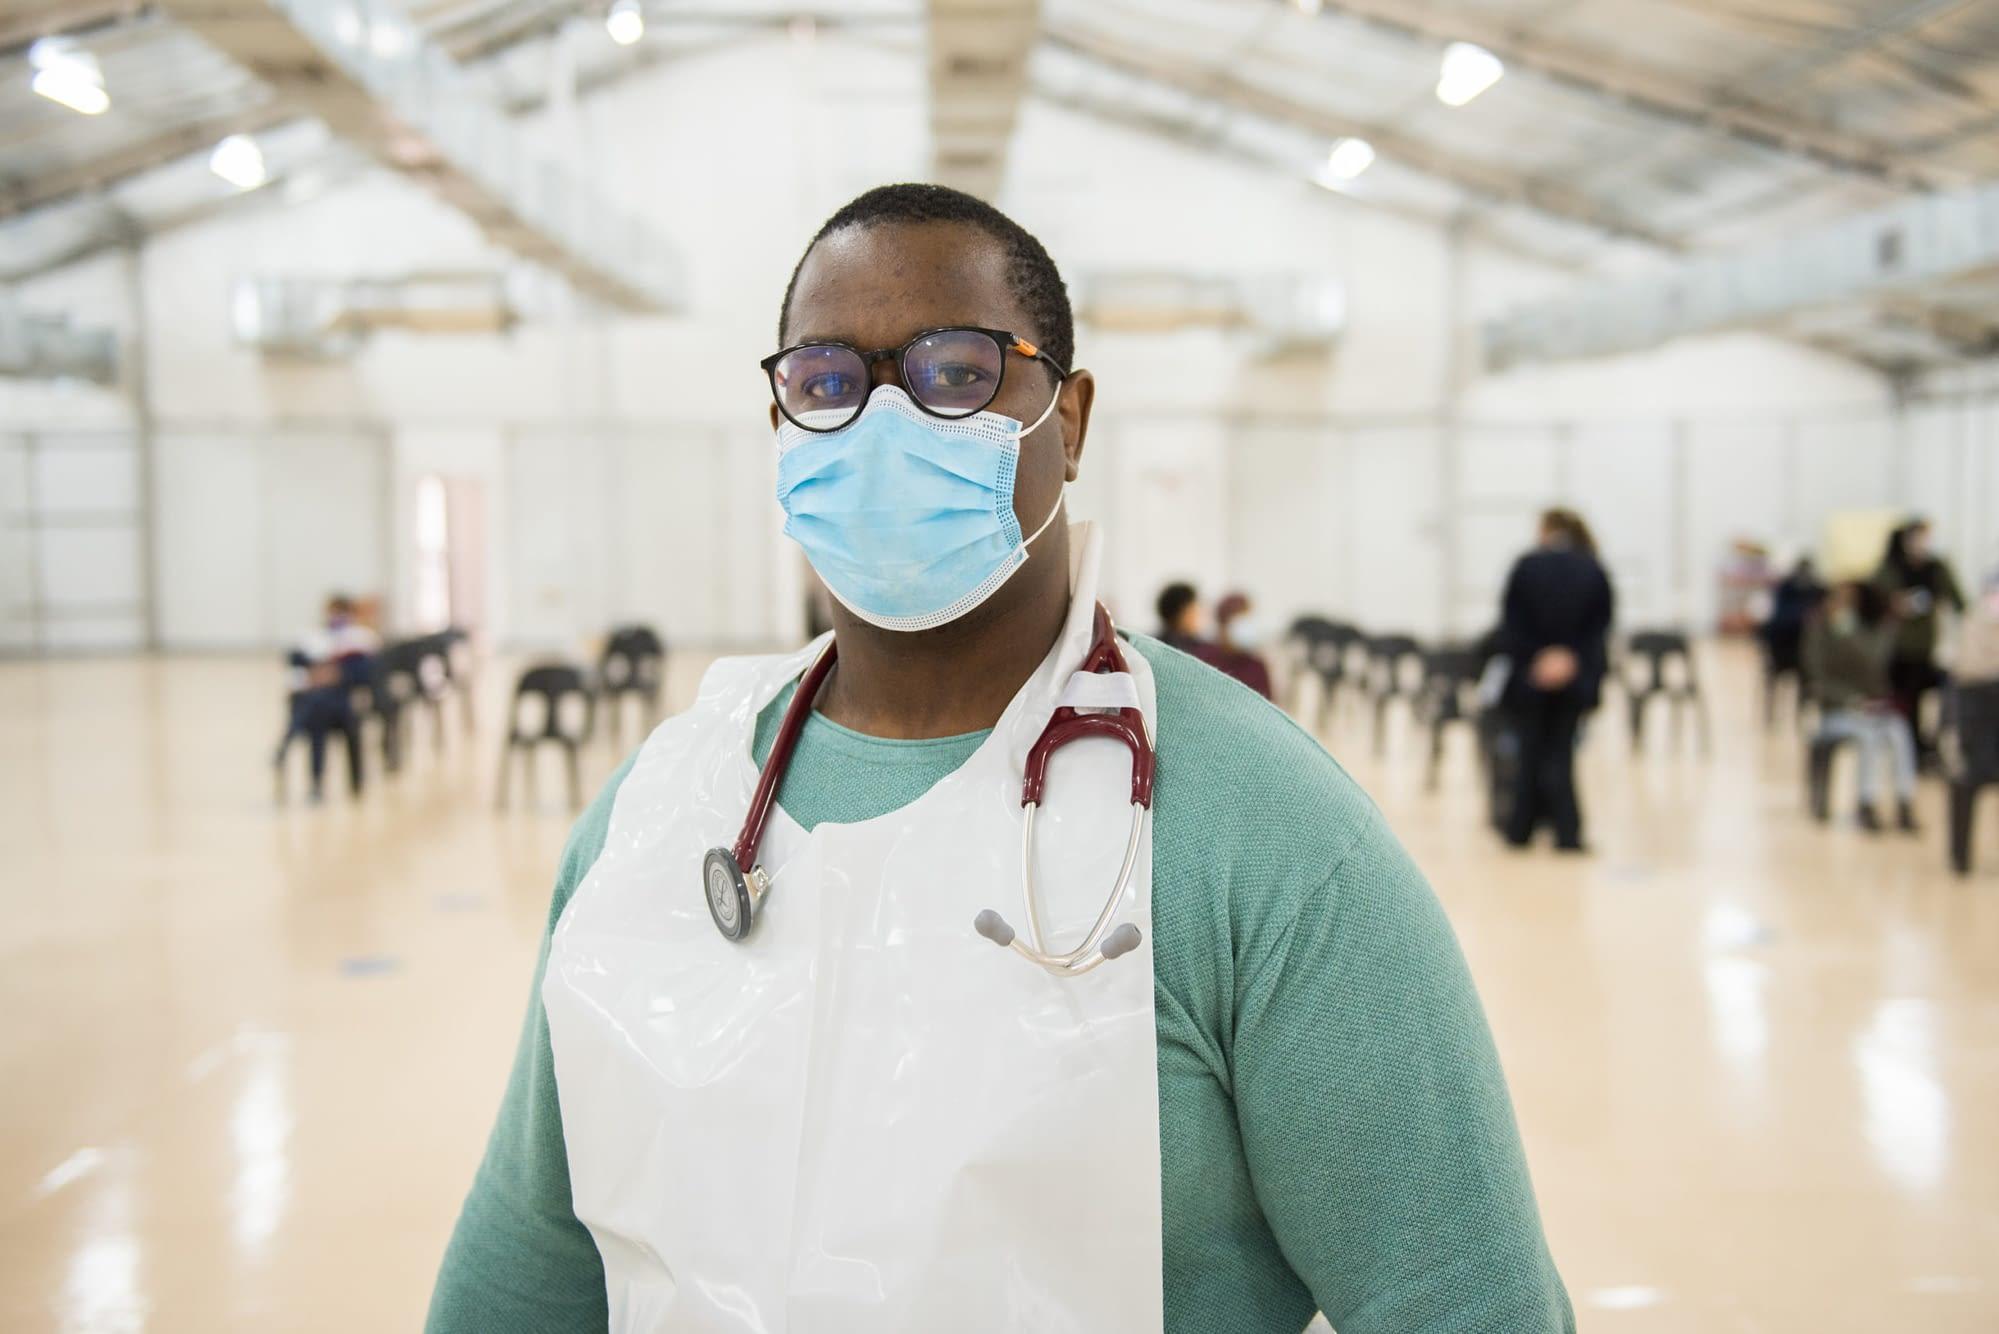 Healthcare worker in hospital